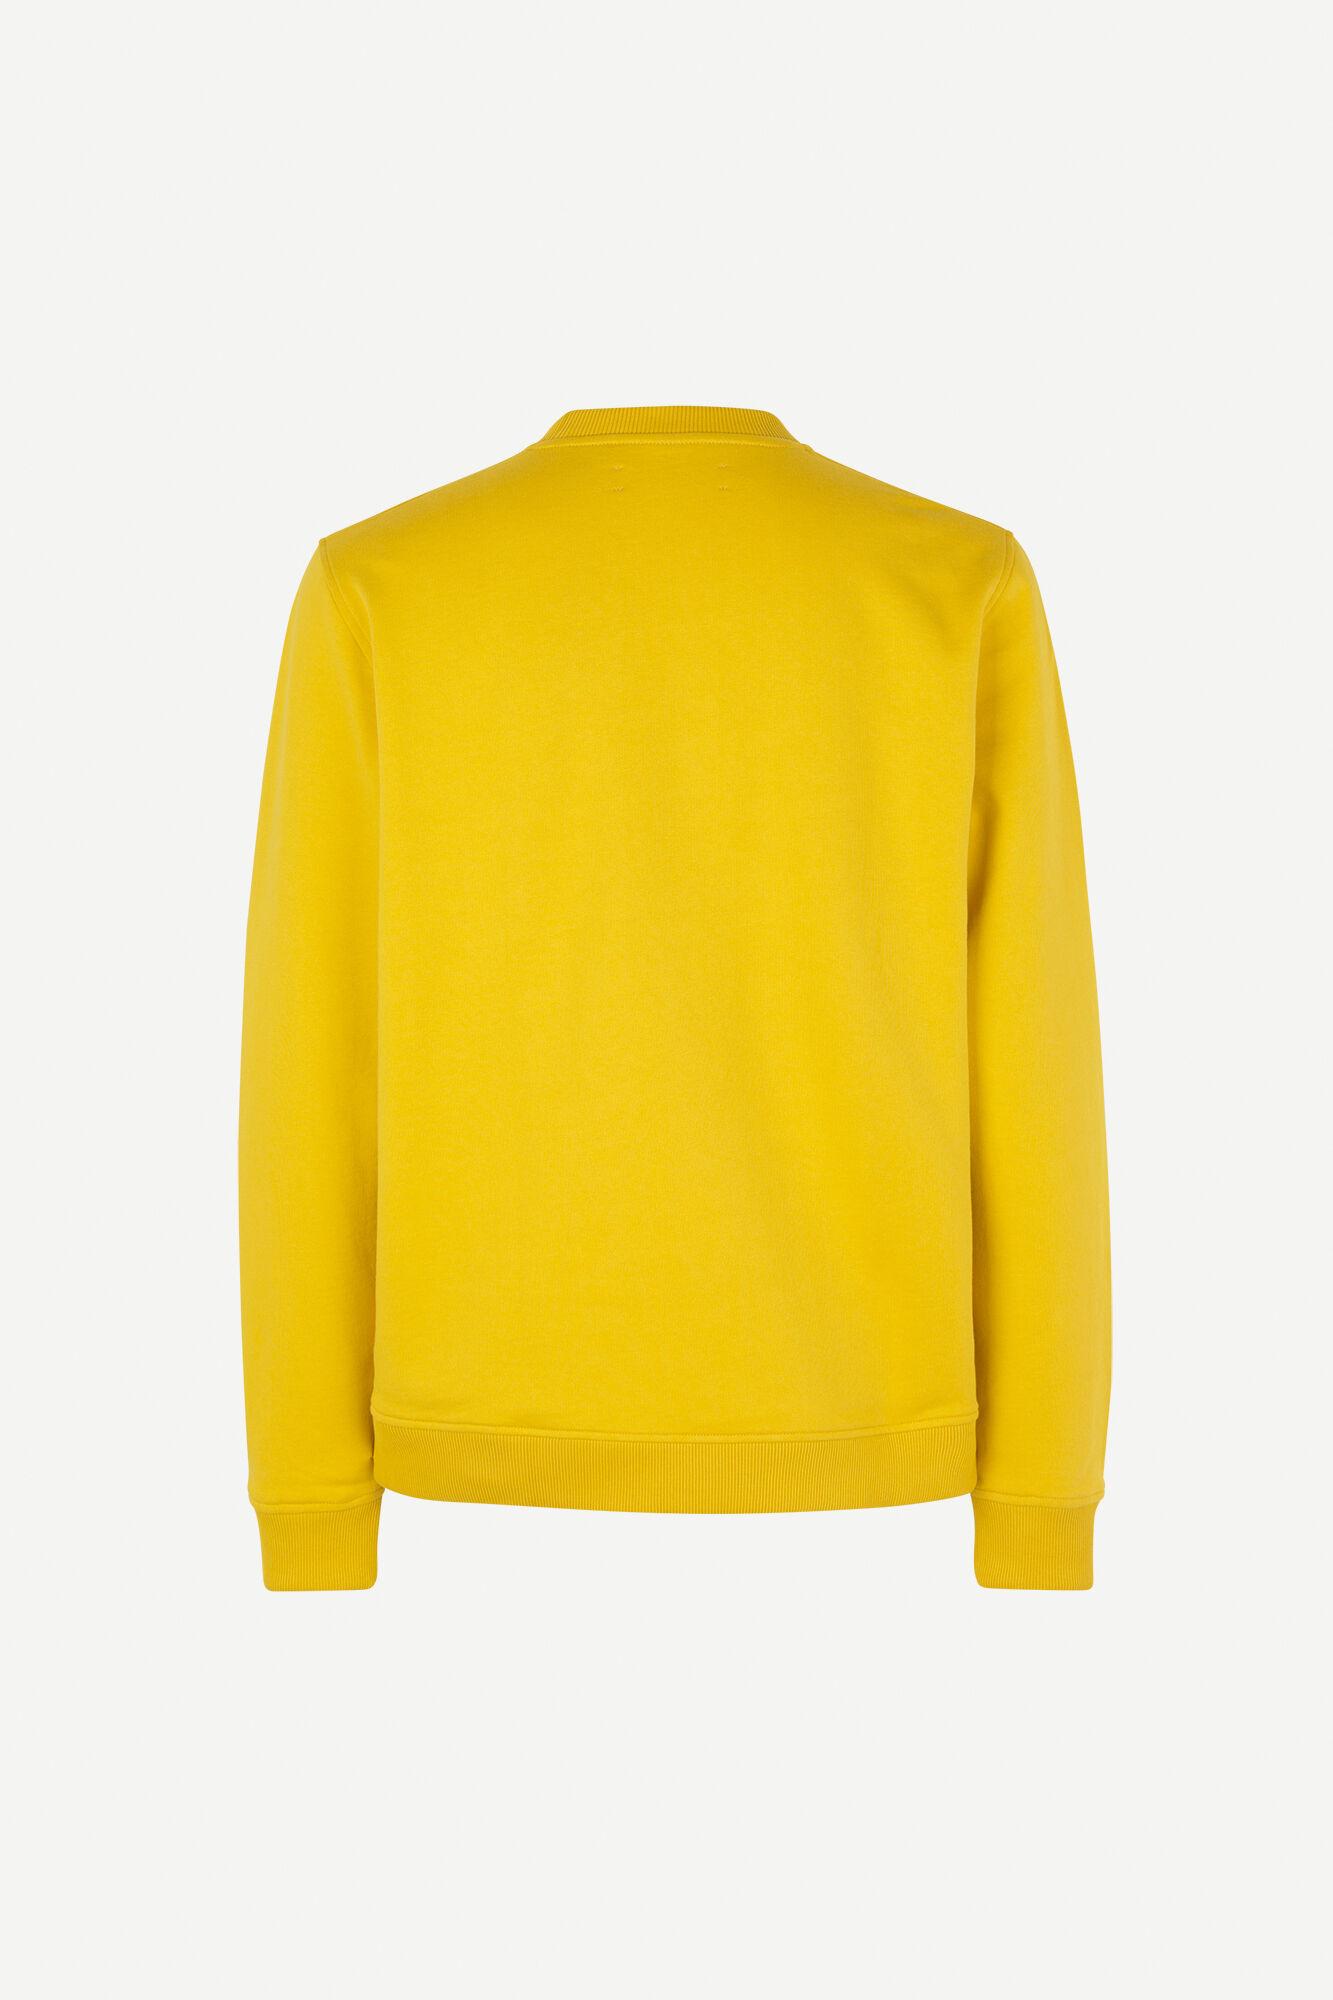 Aviso Crew Neck Sweater Lemon Curry Yellow-2